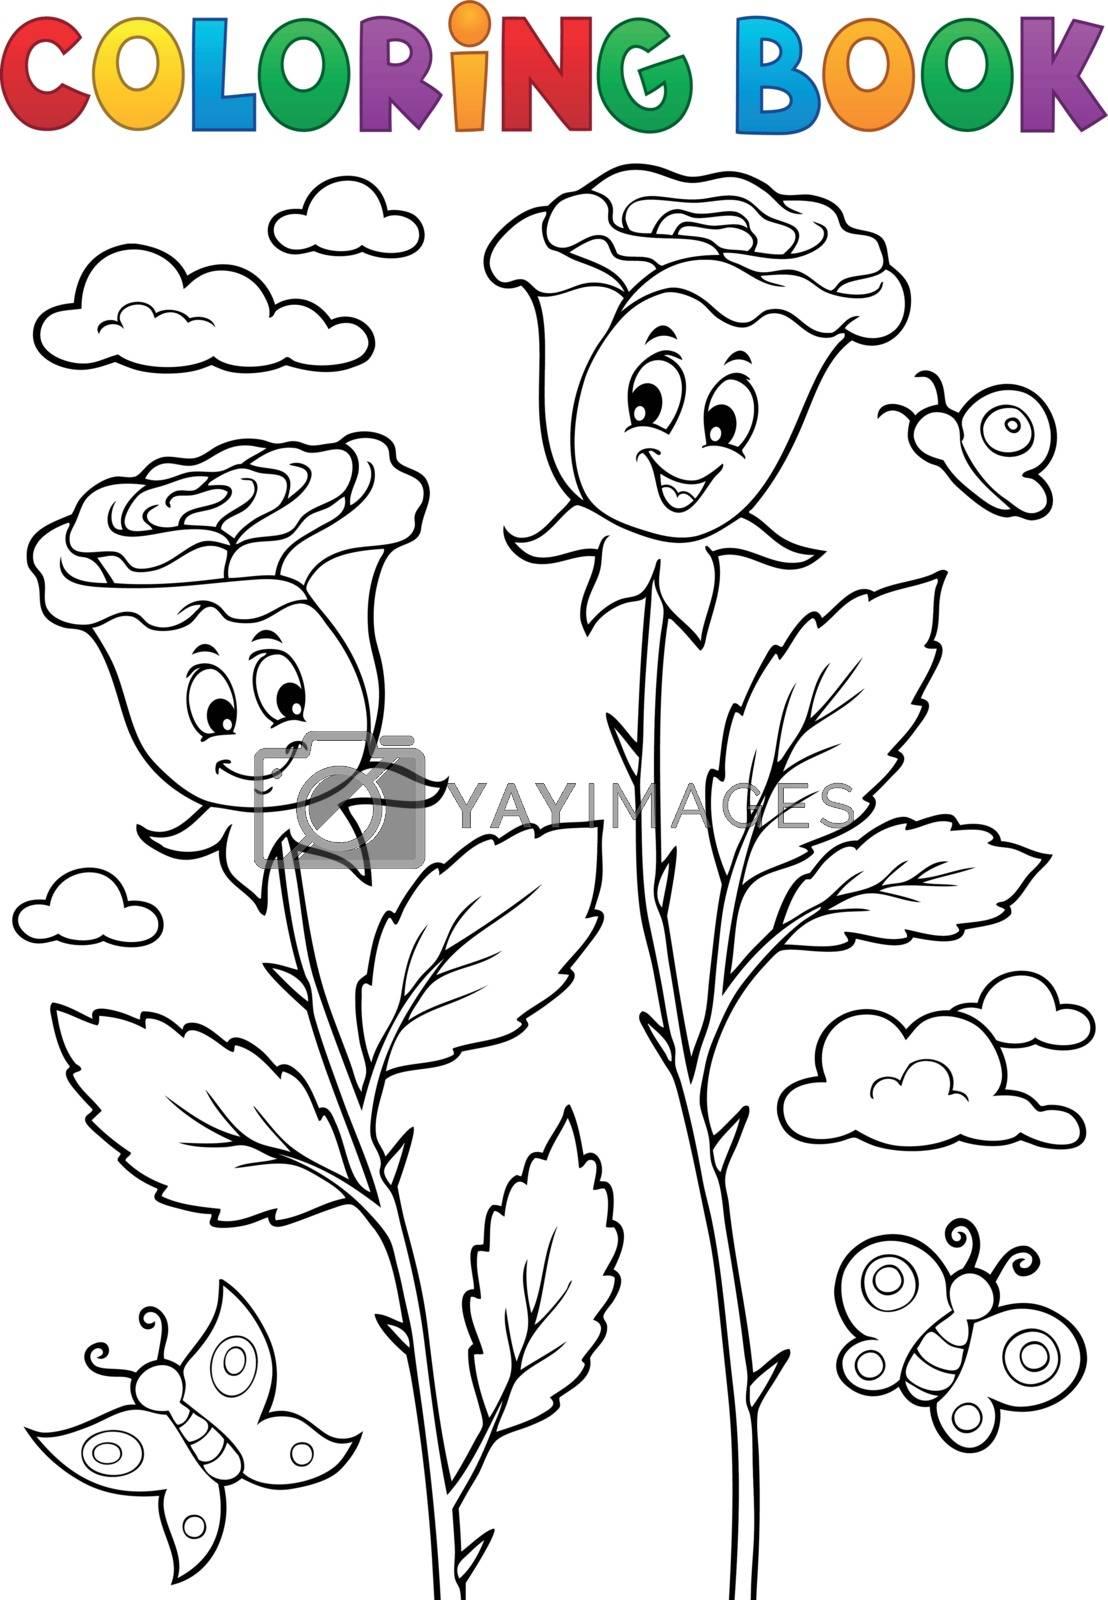 Coloring book rose flower image 2 - eps10 vector illustration.